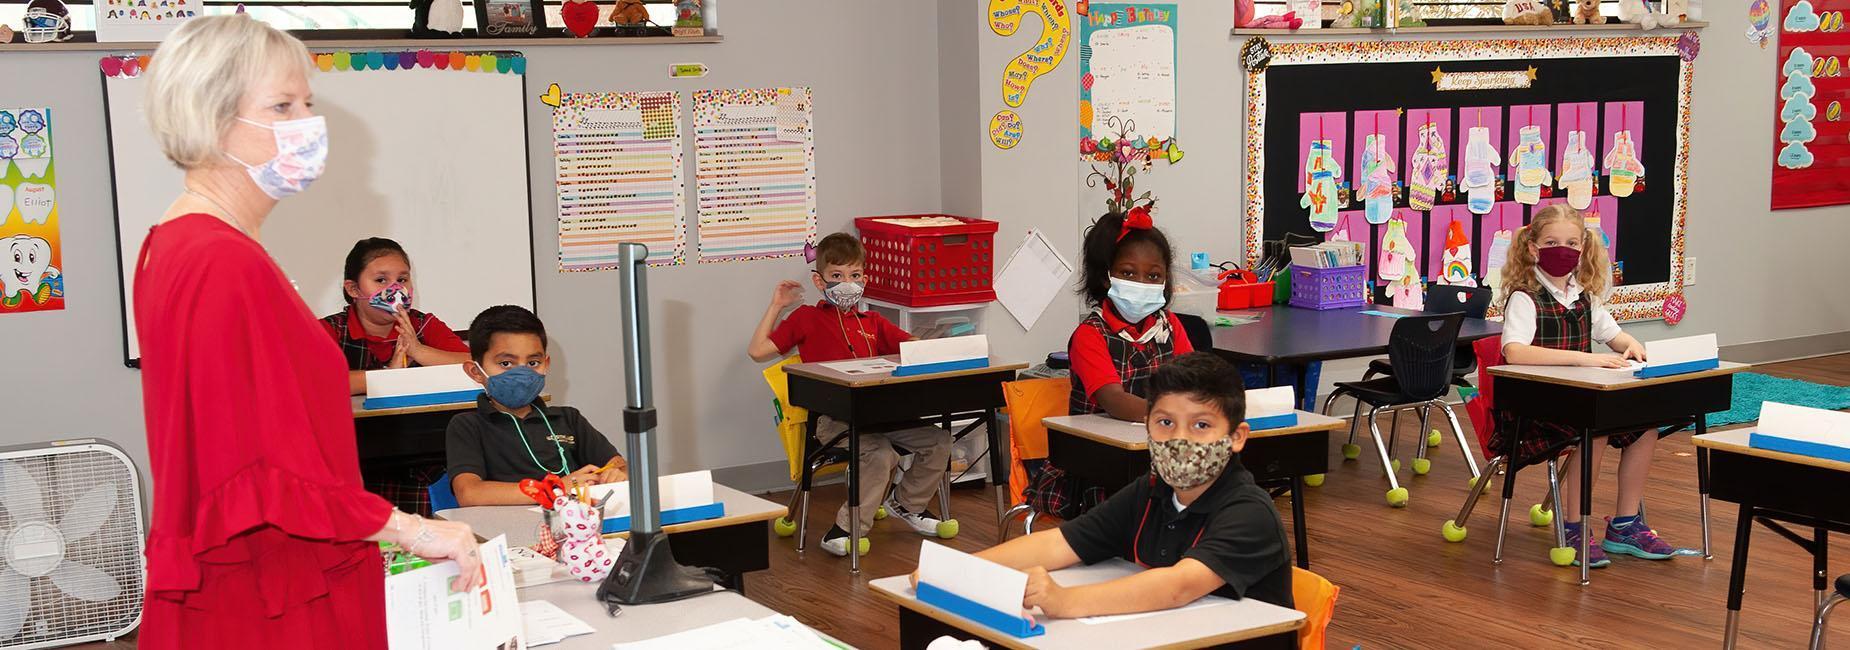 Northland Elementary classroom